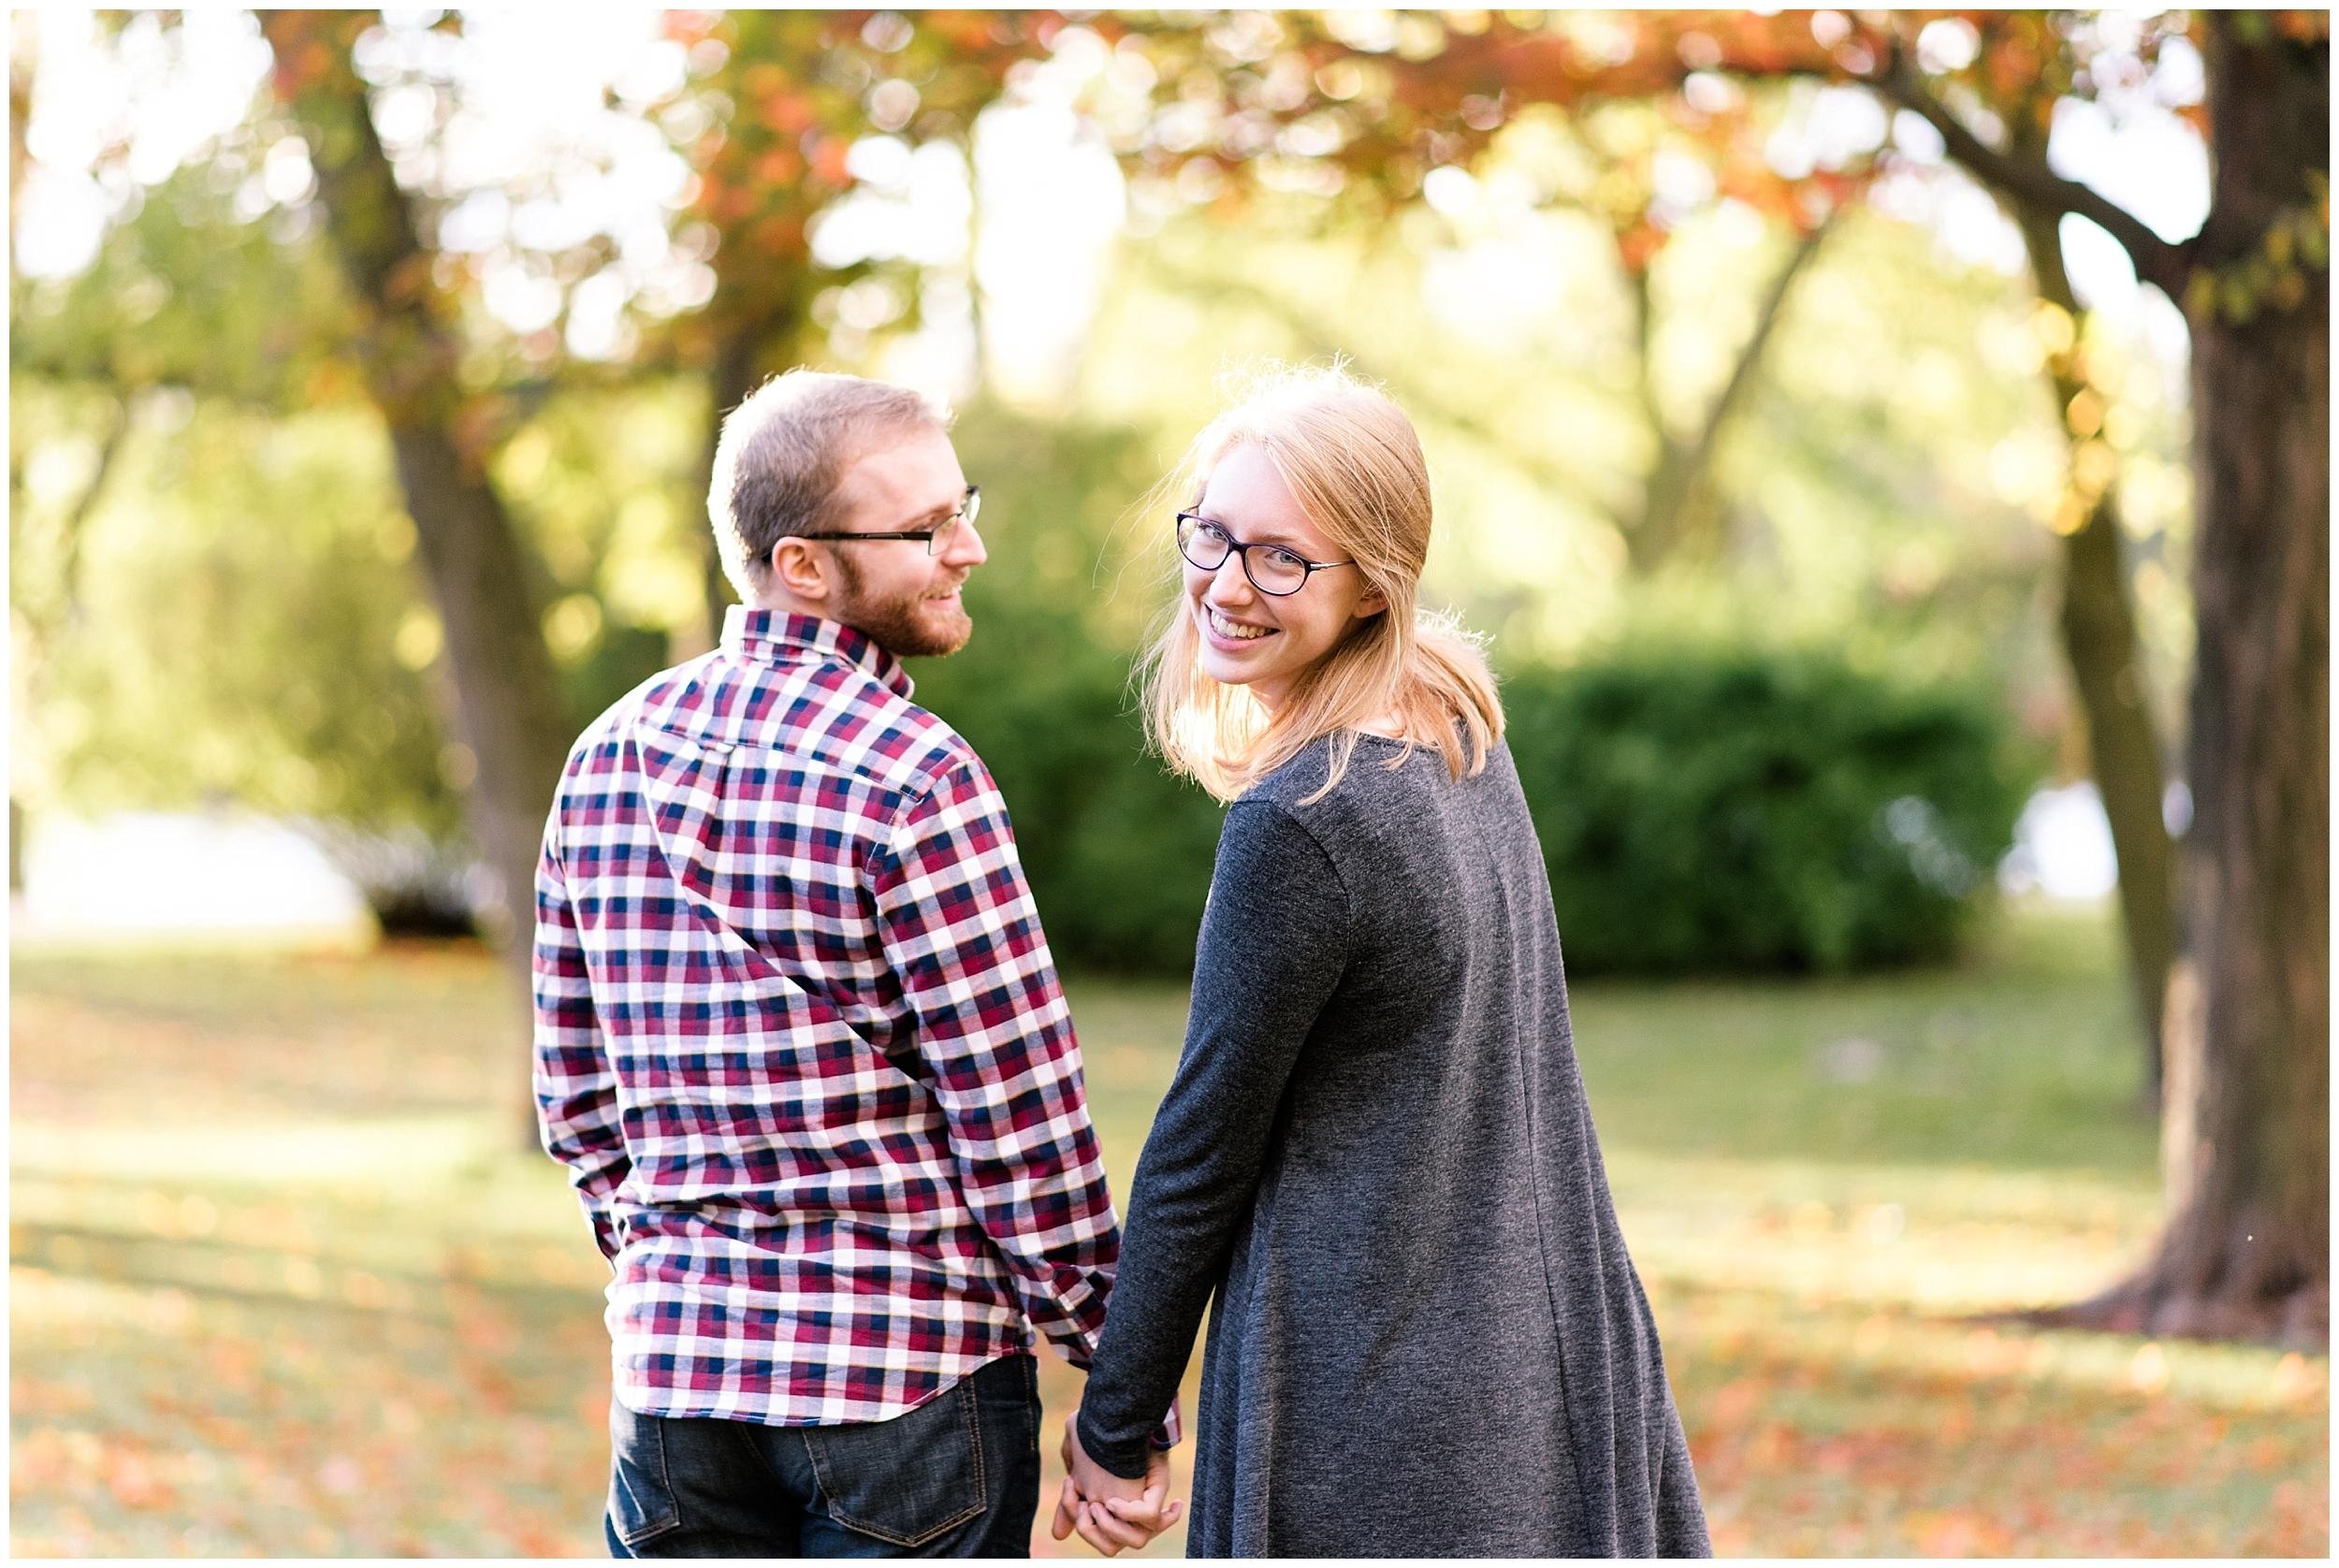 Weddings_by_Raisa_Photography_Grand_Rapids_October_Fall_Engagement_Milwaukee_Wisconsin_Photographer_0011.jpg